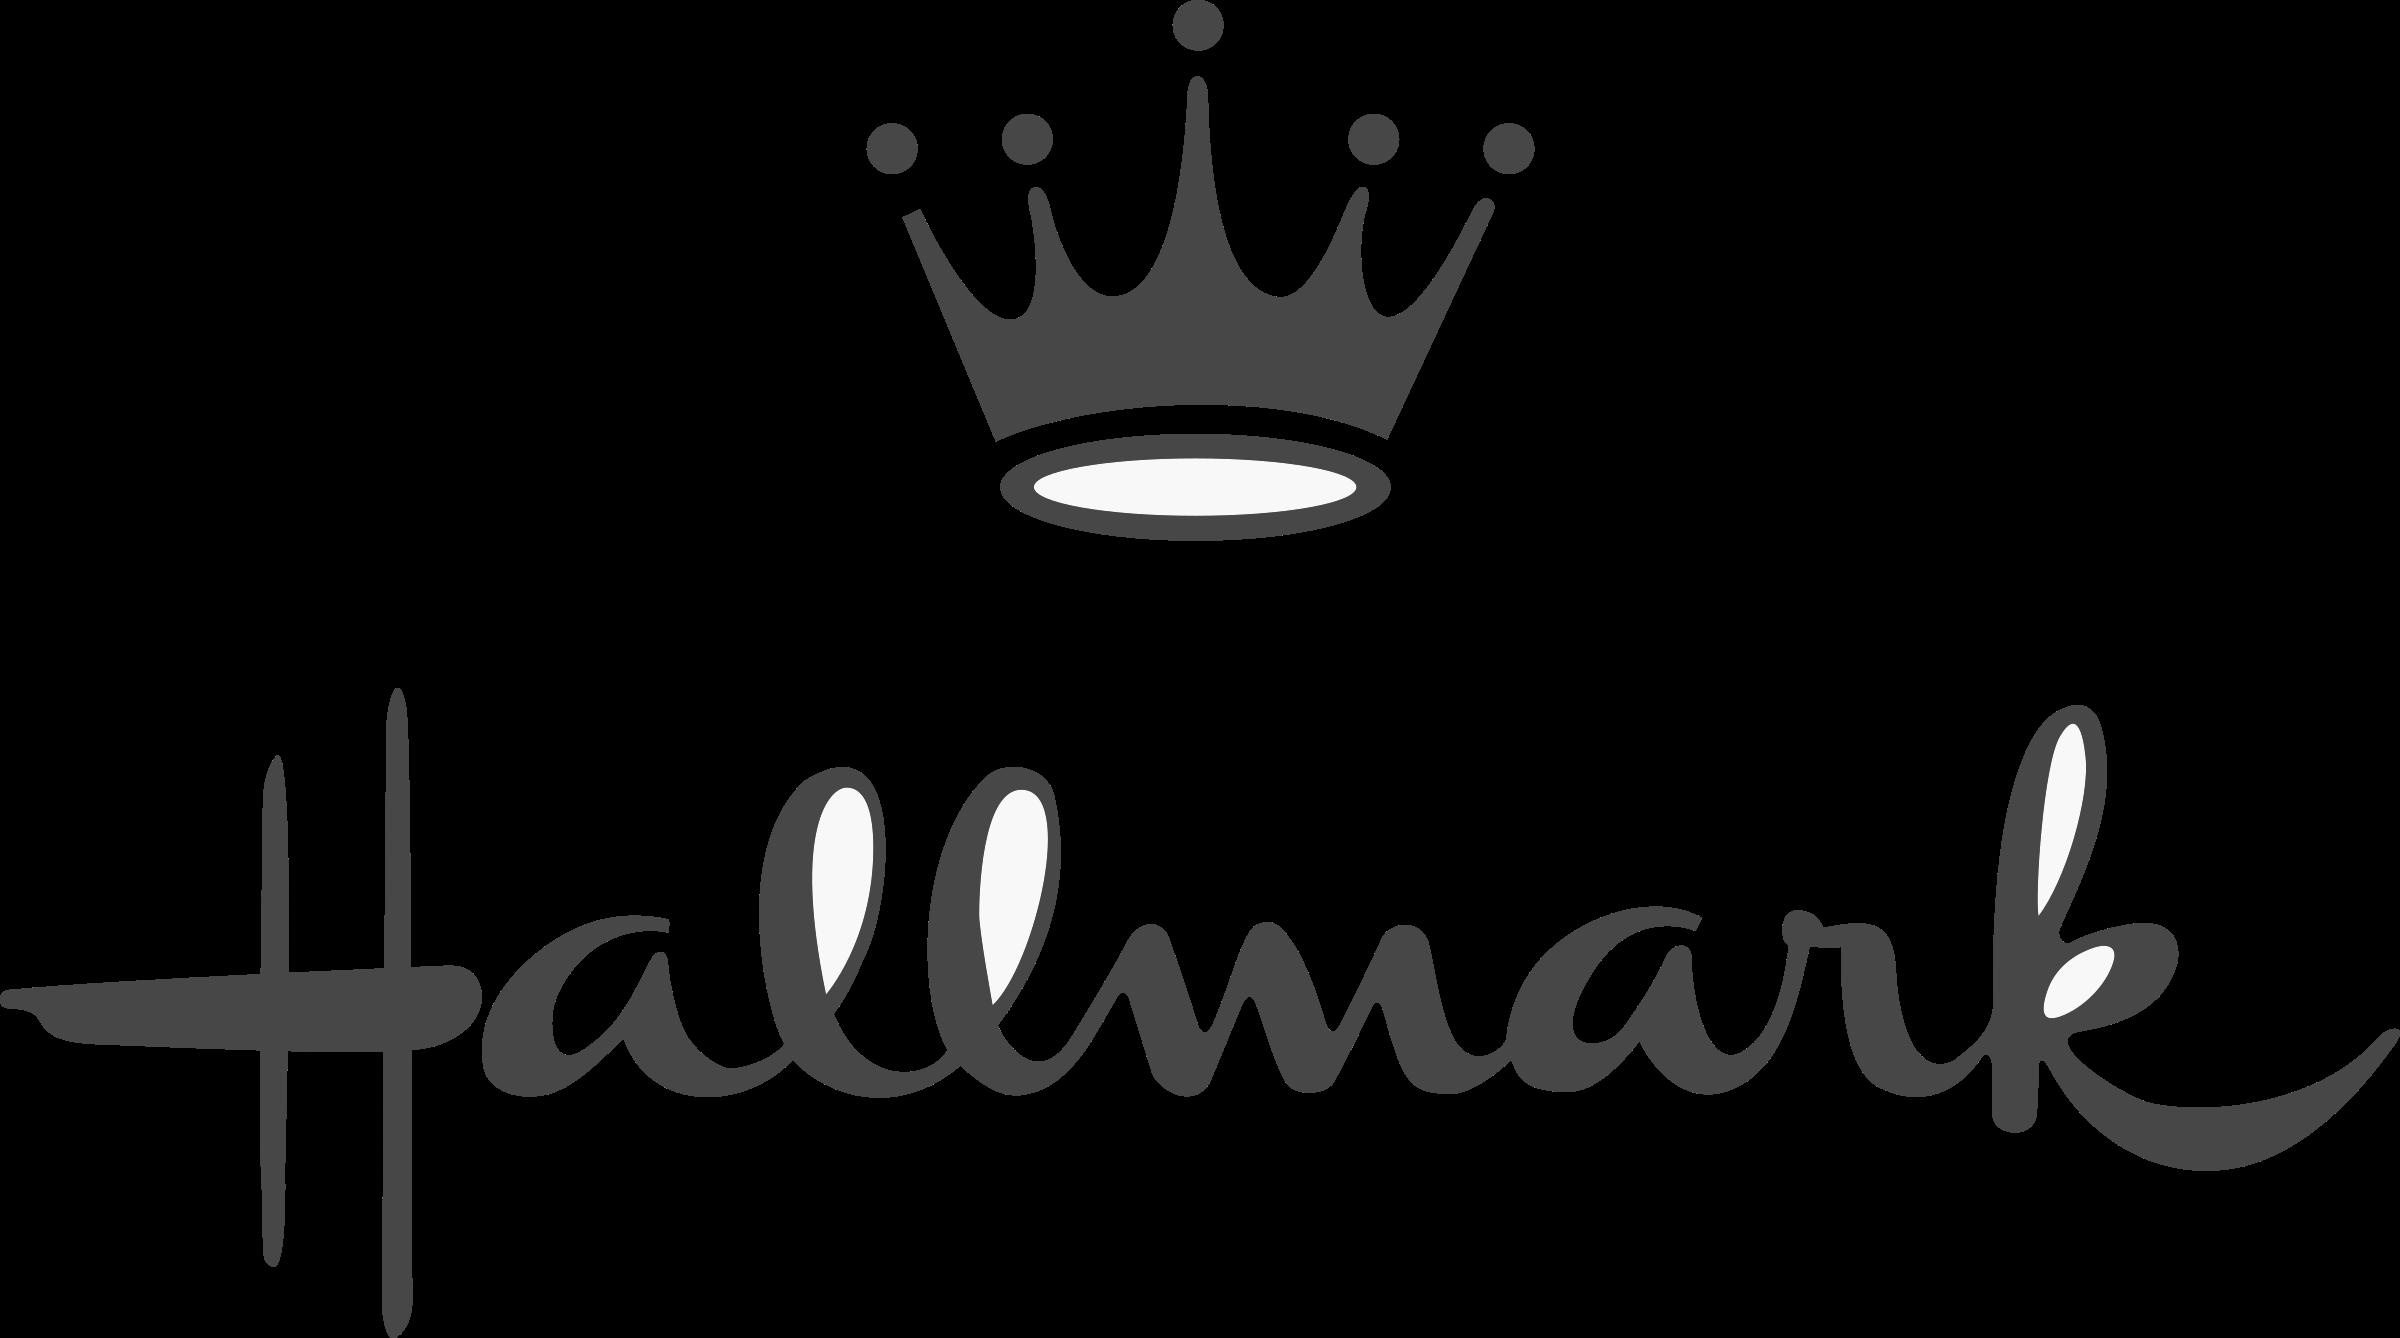 hallmark-4-logo-png-transparent.png